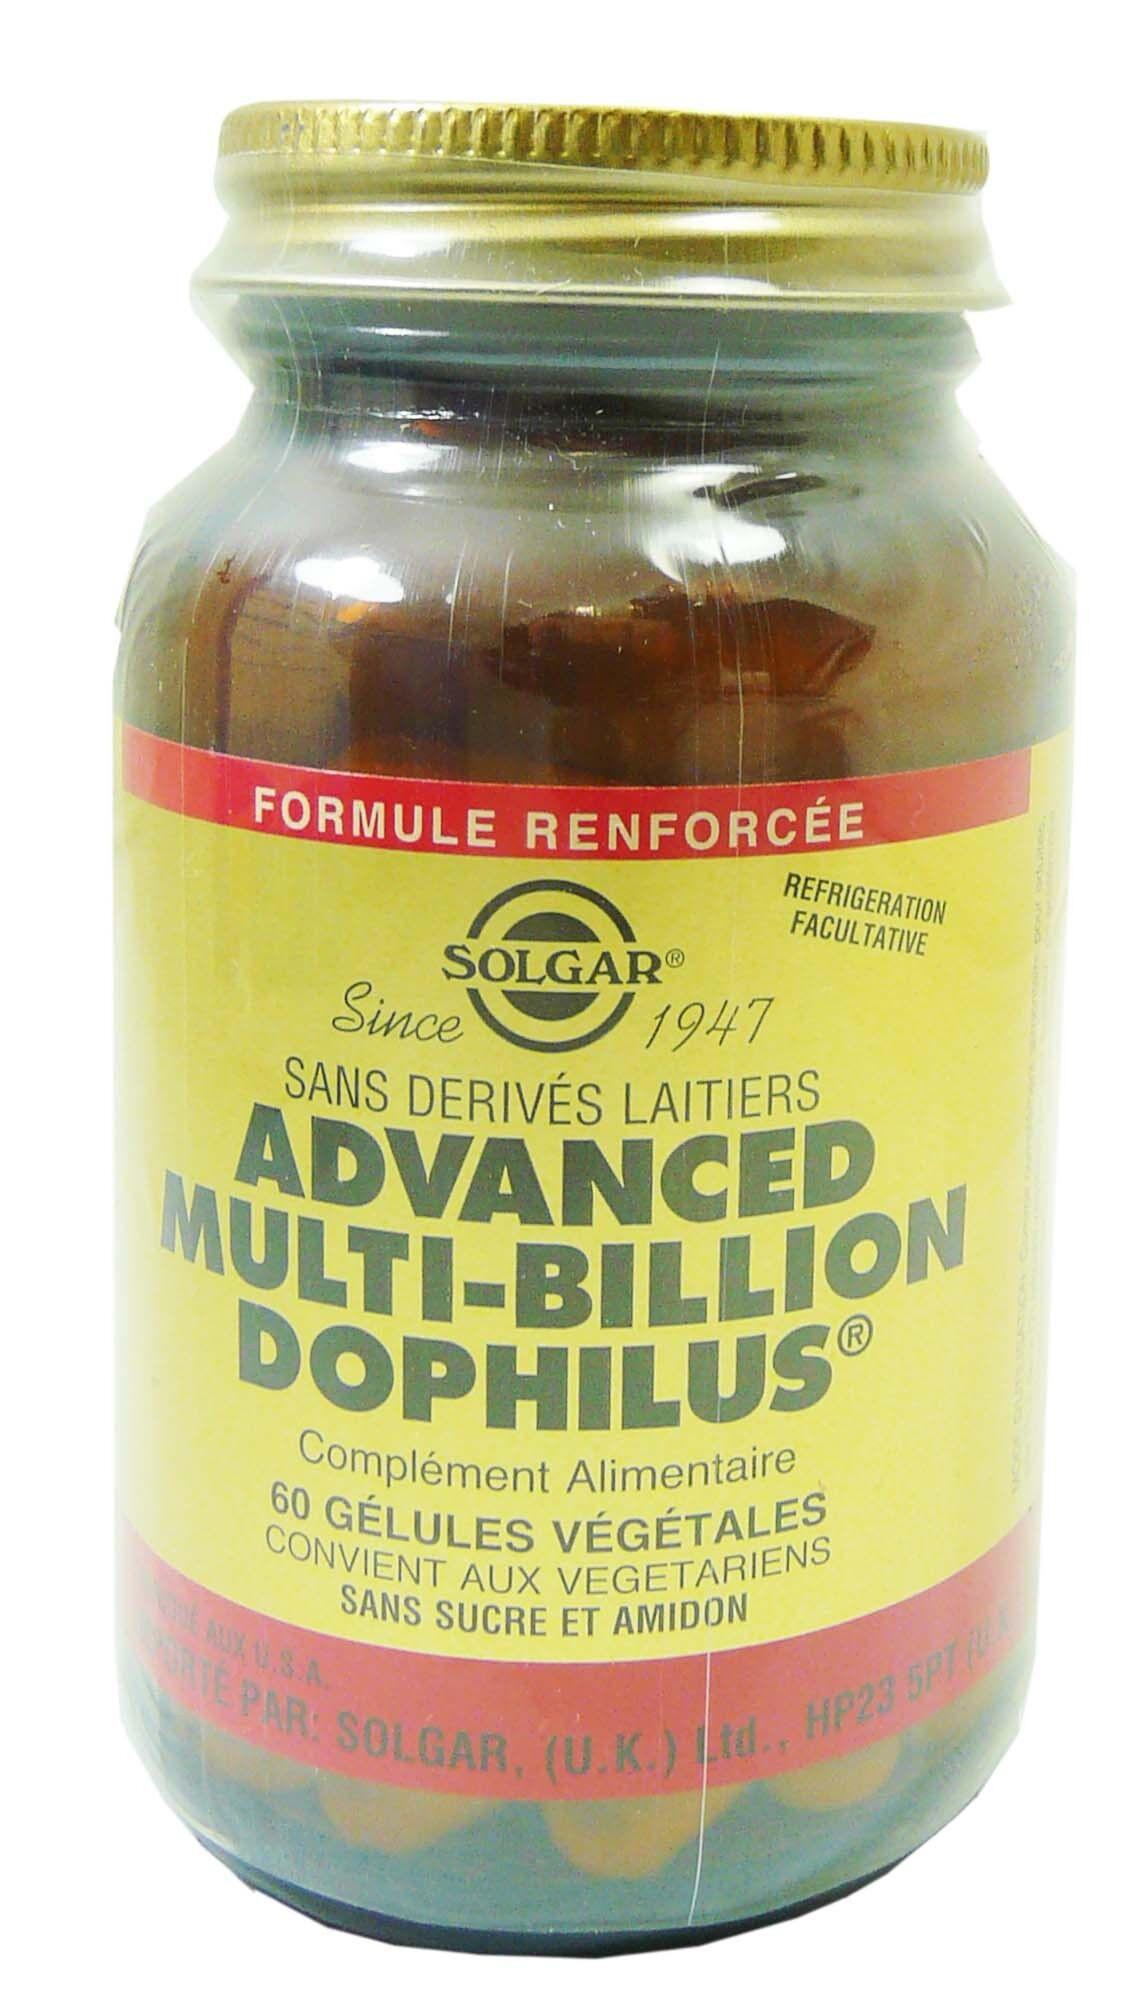 Solgar advanced multi billion dophilus 60 gelules